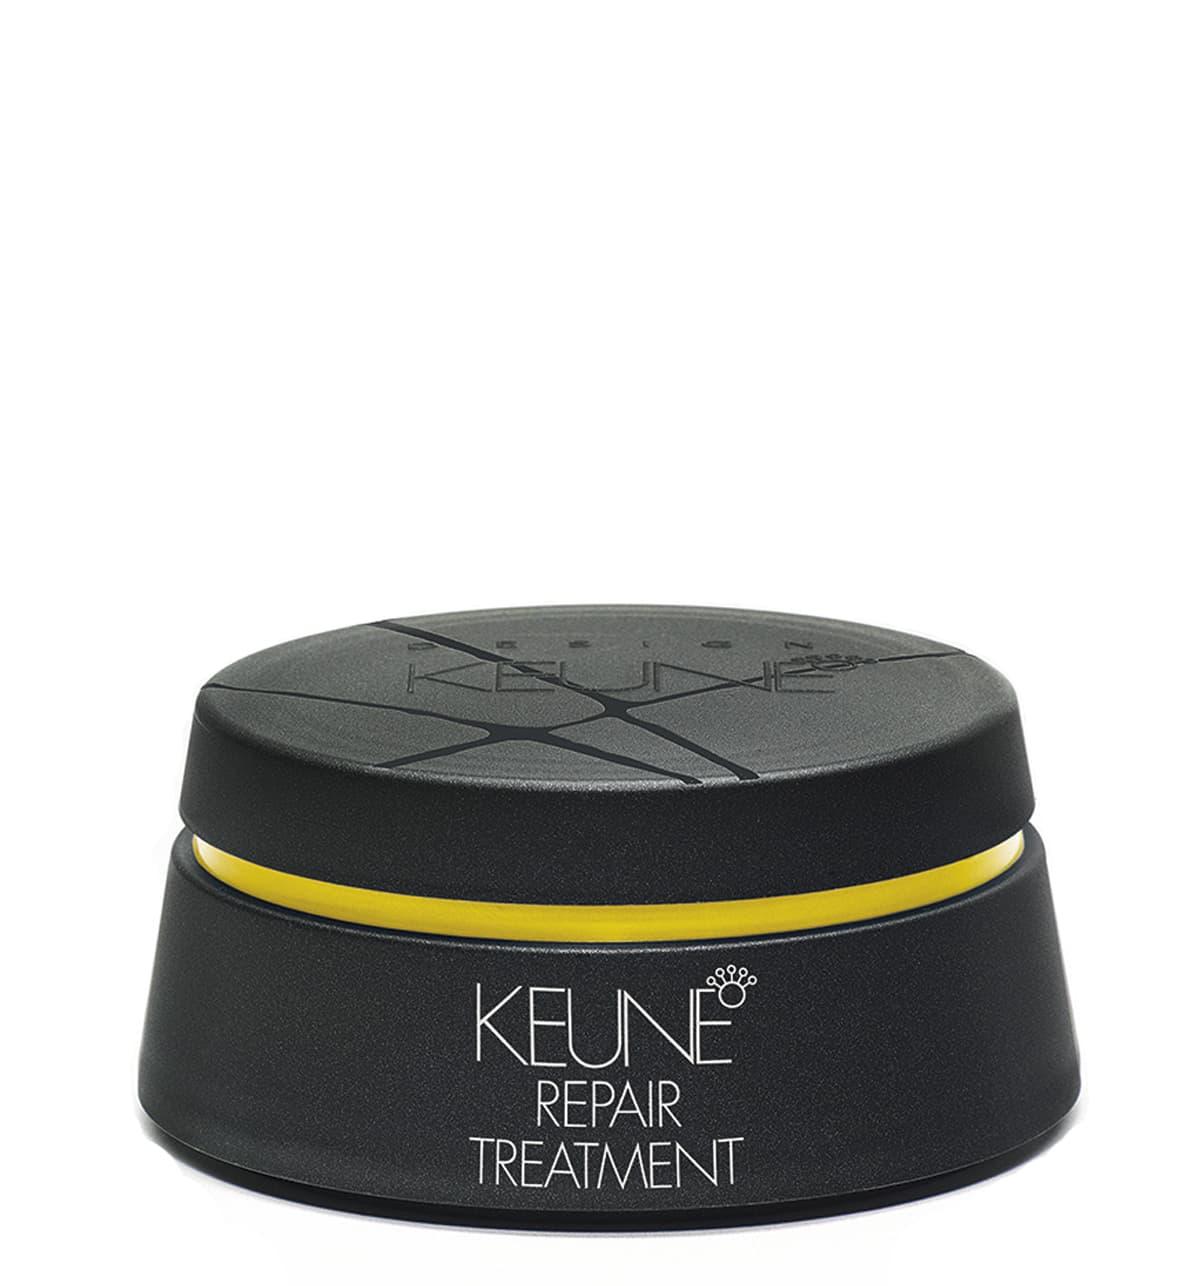 Keune Repair Treatment Маска Восстановление